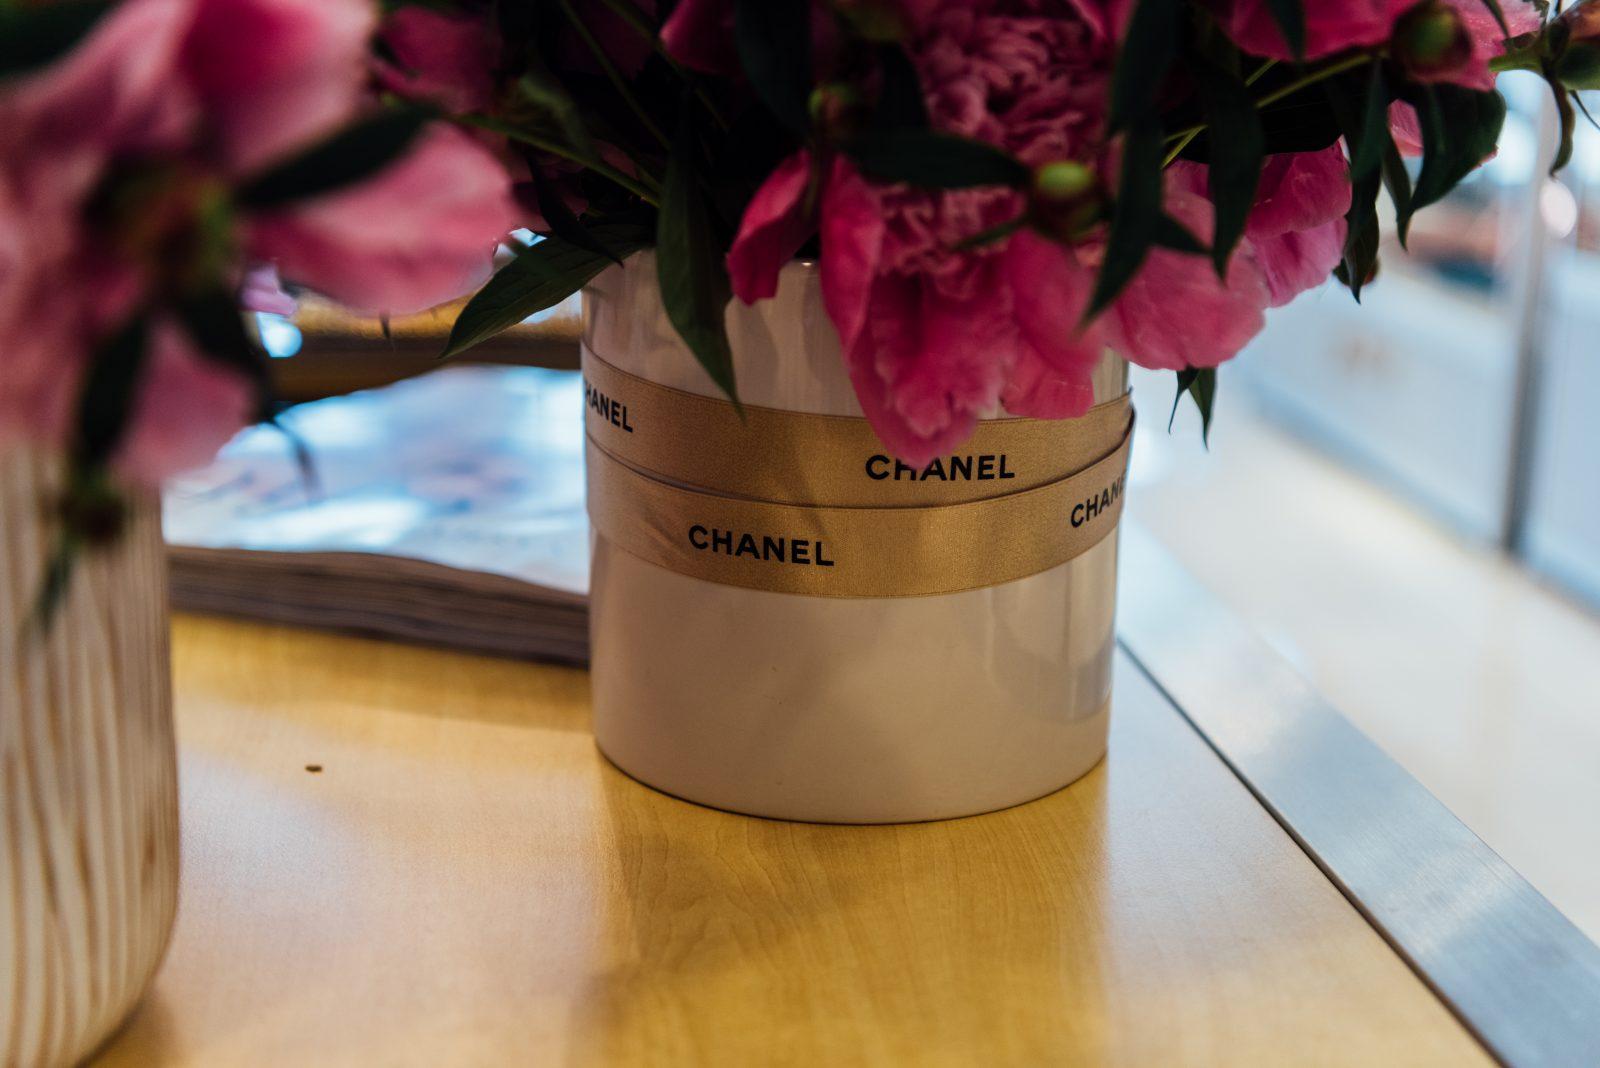 Chanel branding ribbons around flower vases at Gus Mayer